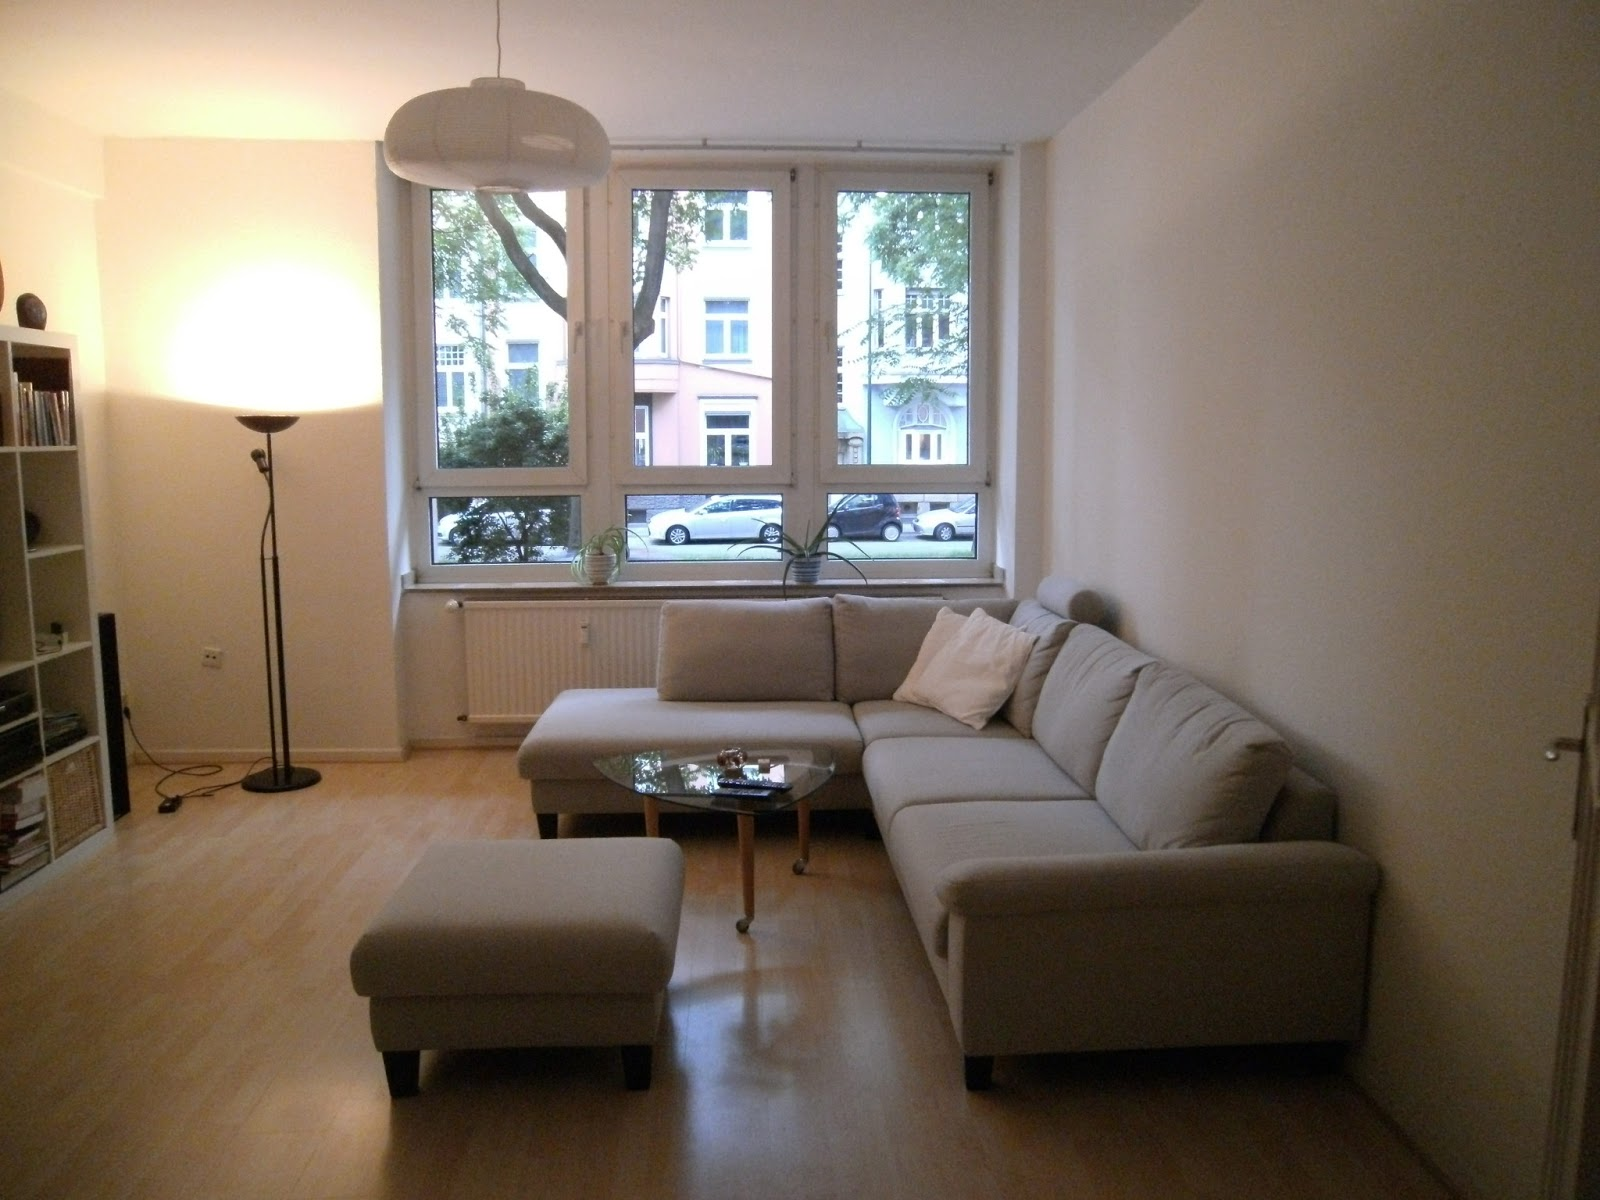 La sista minimalista unser minimalistisches wohnzimmer - Minimalistisches wohnzimmer ...